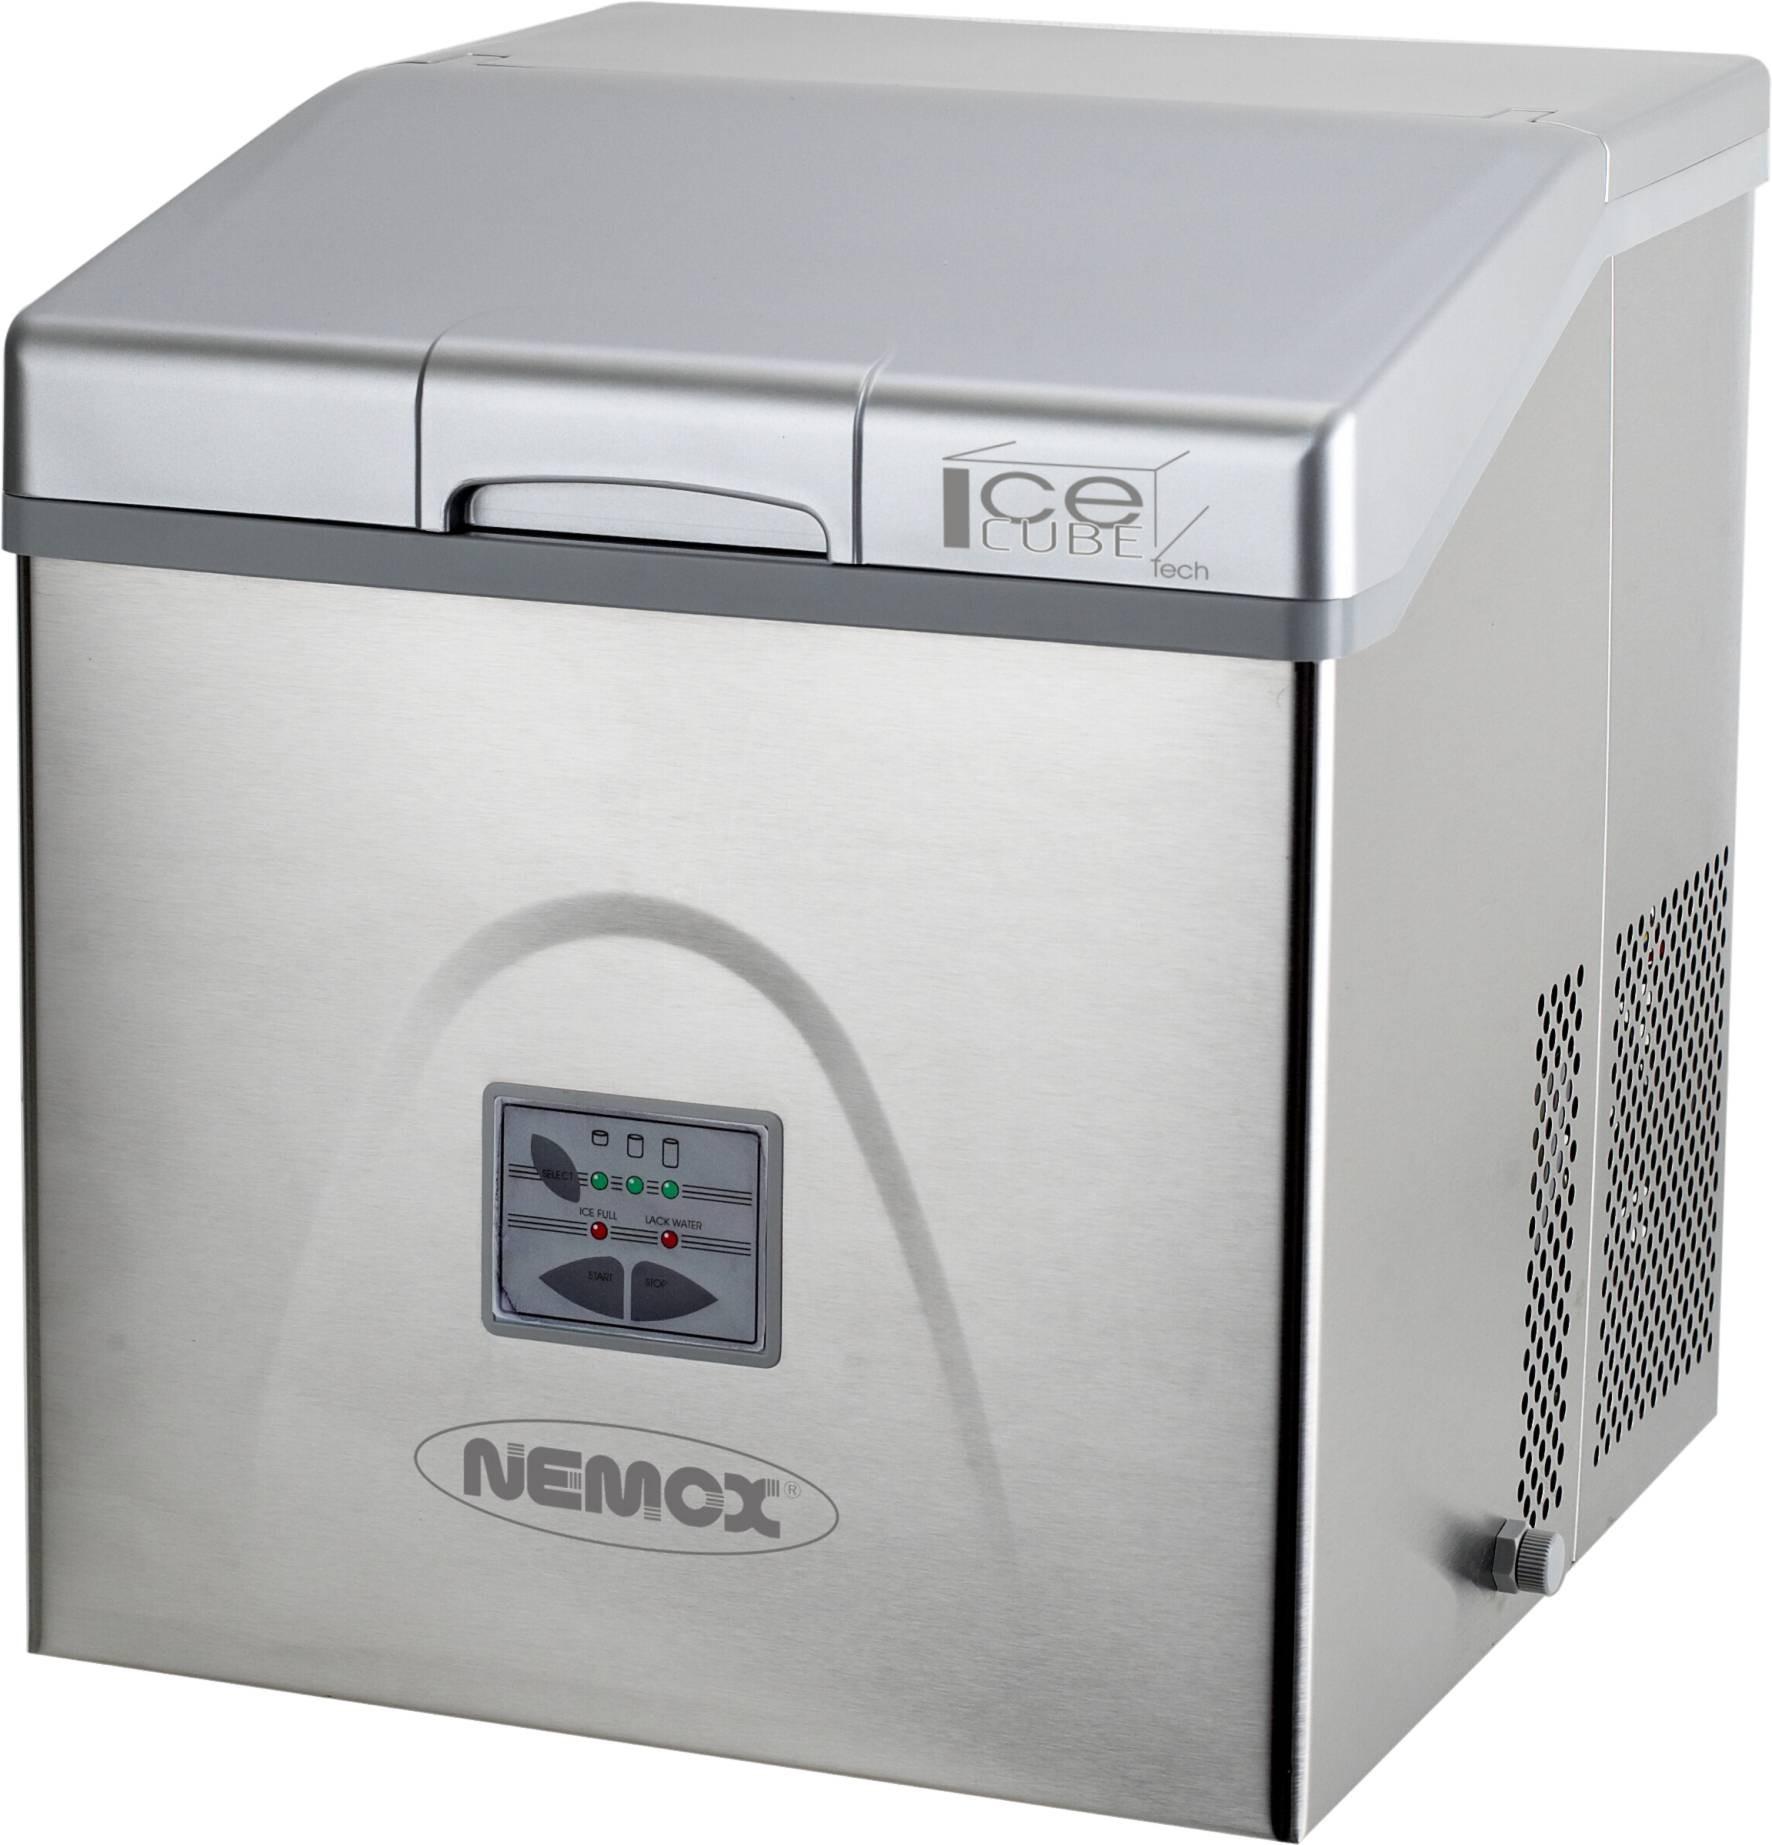 NEMOX Eiswürfelbereiter Ice cube Tech